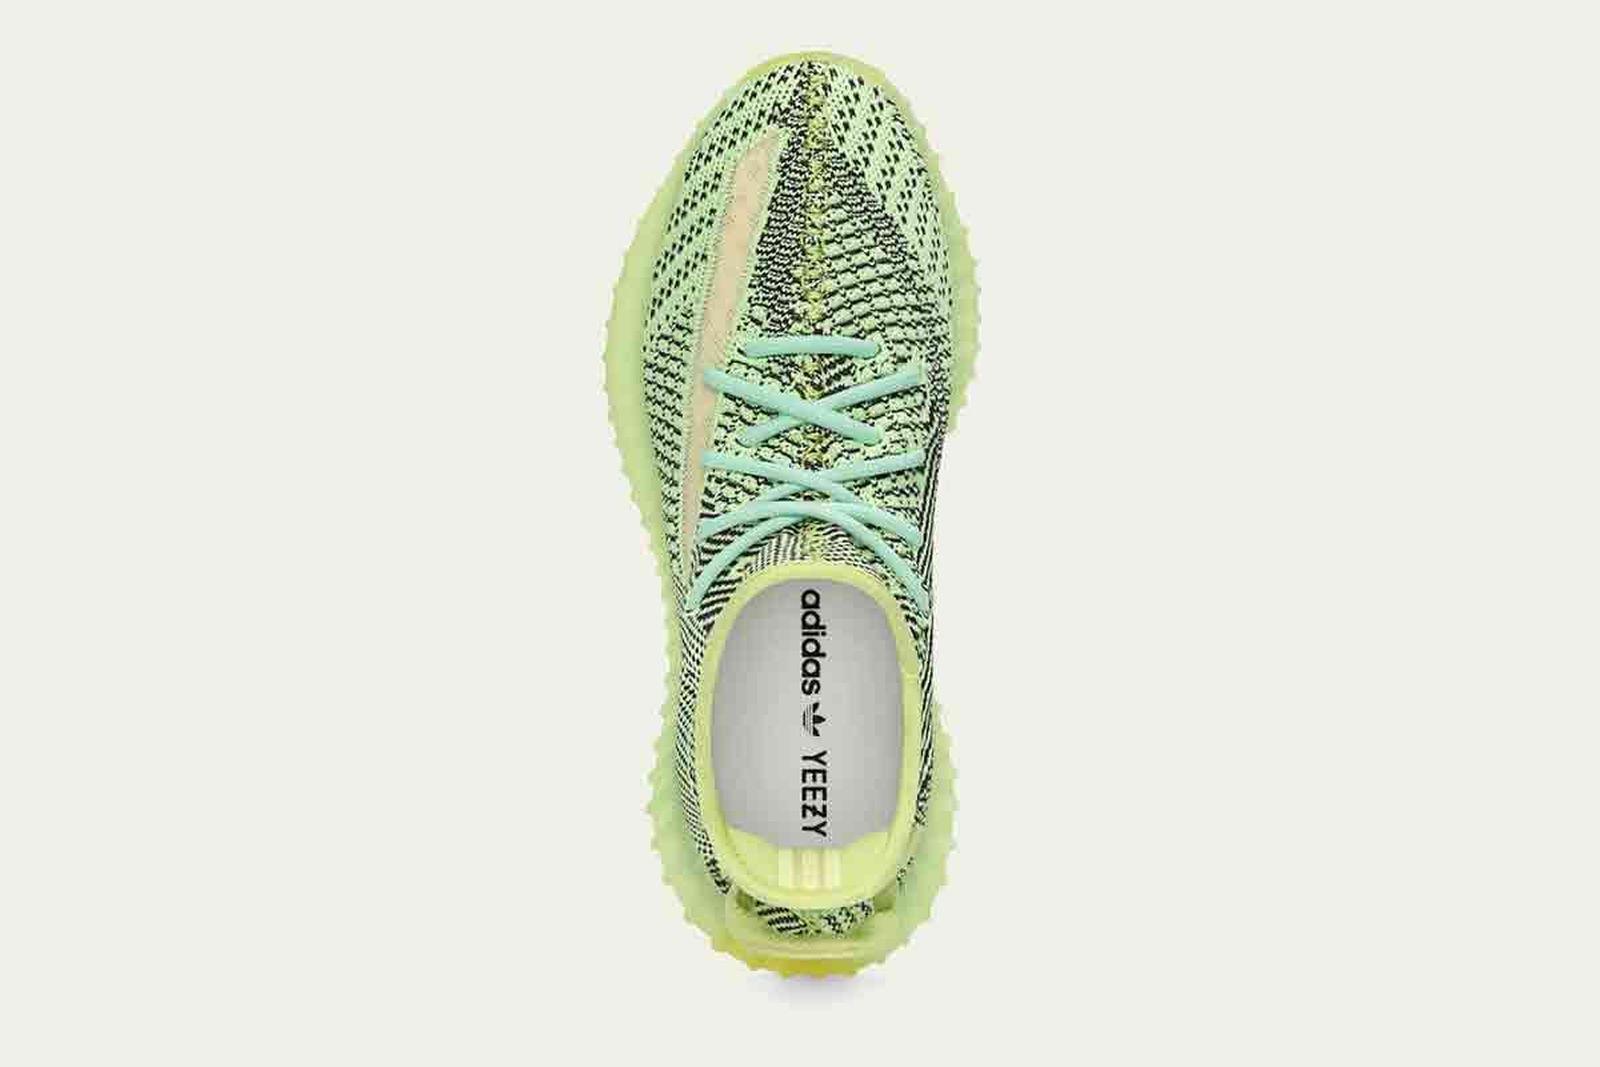 adidas-yeezy-boost-350-v2-yeezyreel-release-date-price-07